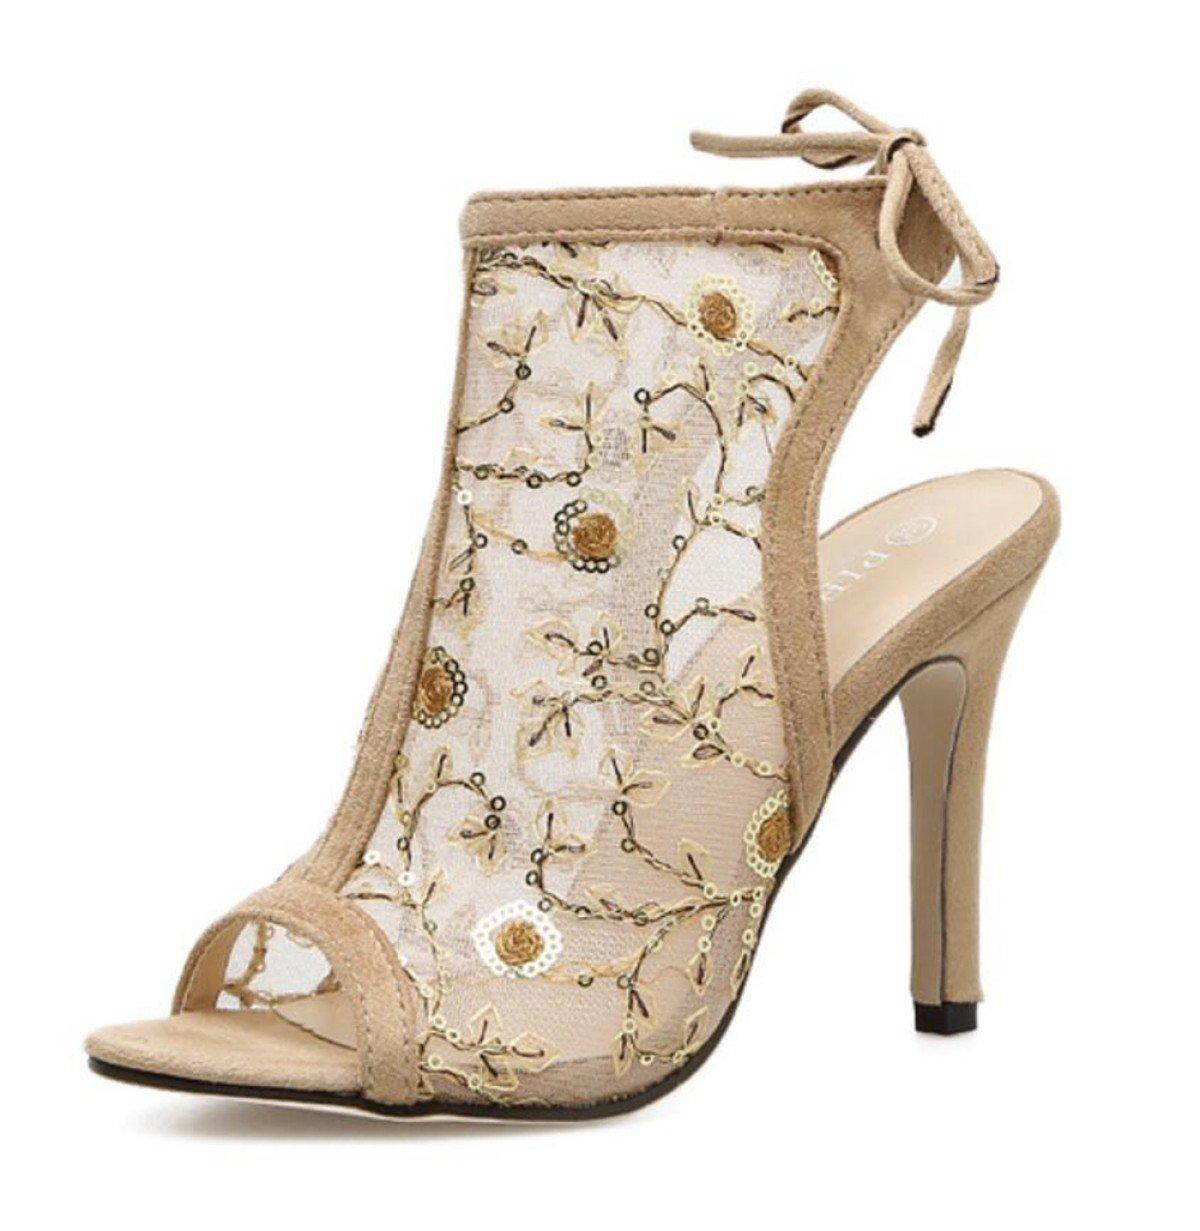 LINYI Damenschuhe 2018 Sommer Geschnitzt Mesh High Heel Offene Zehe Sandalen B07BLSQKX5 Sport- & Outdoorschuhe eine große Vielfalt von Waren